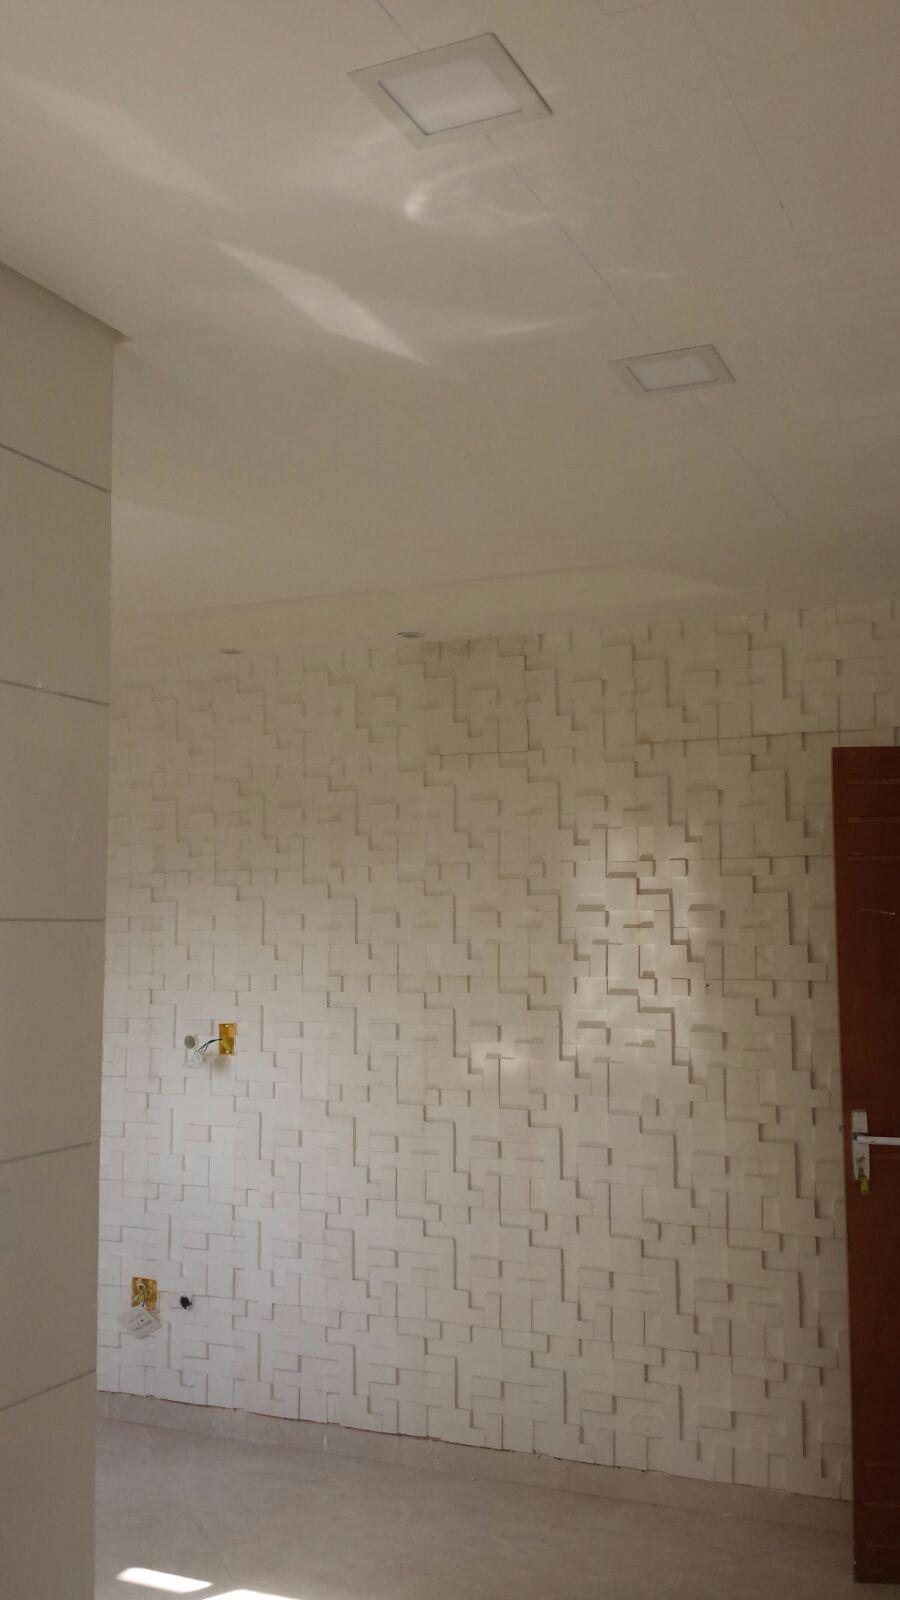 03 - Mosaico 3D